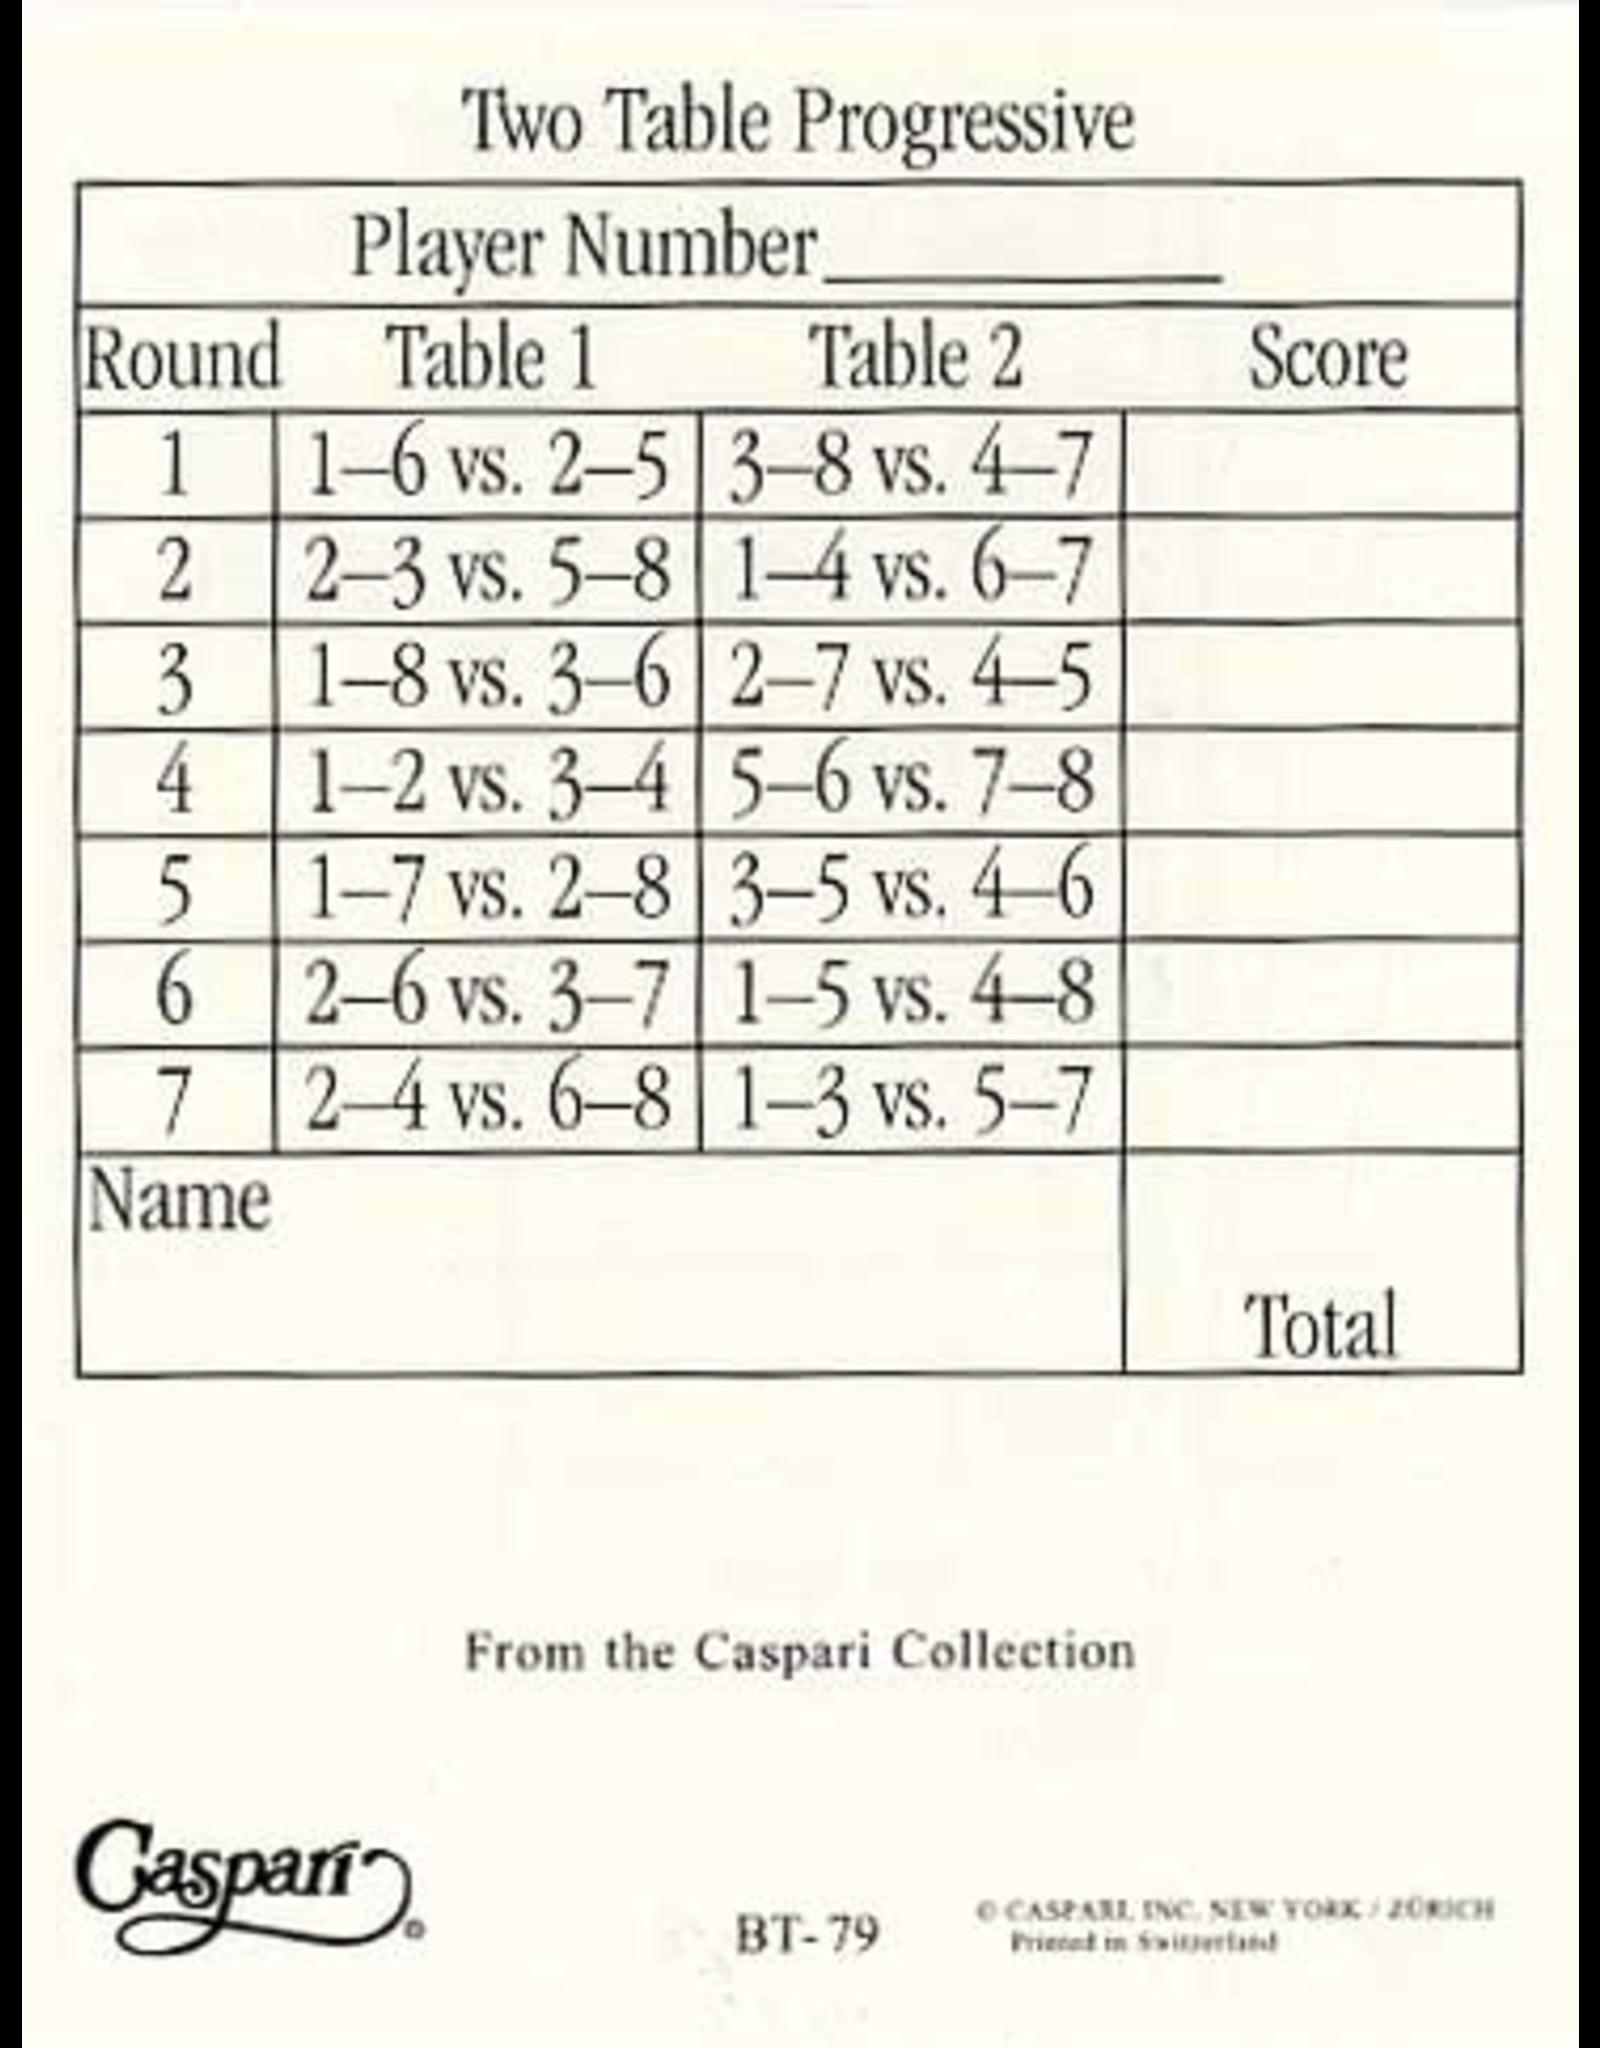 Caspari Bridge Tallies 12 Pack of 12 Sheets Per Pack - Sea Fans